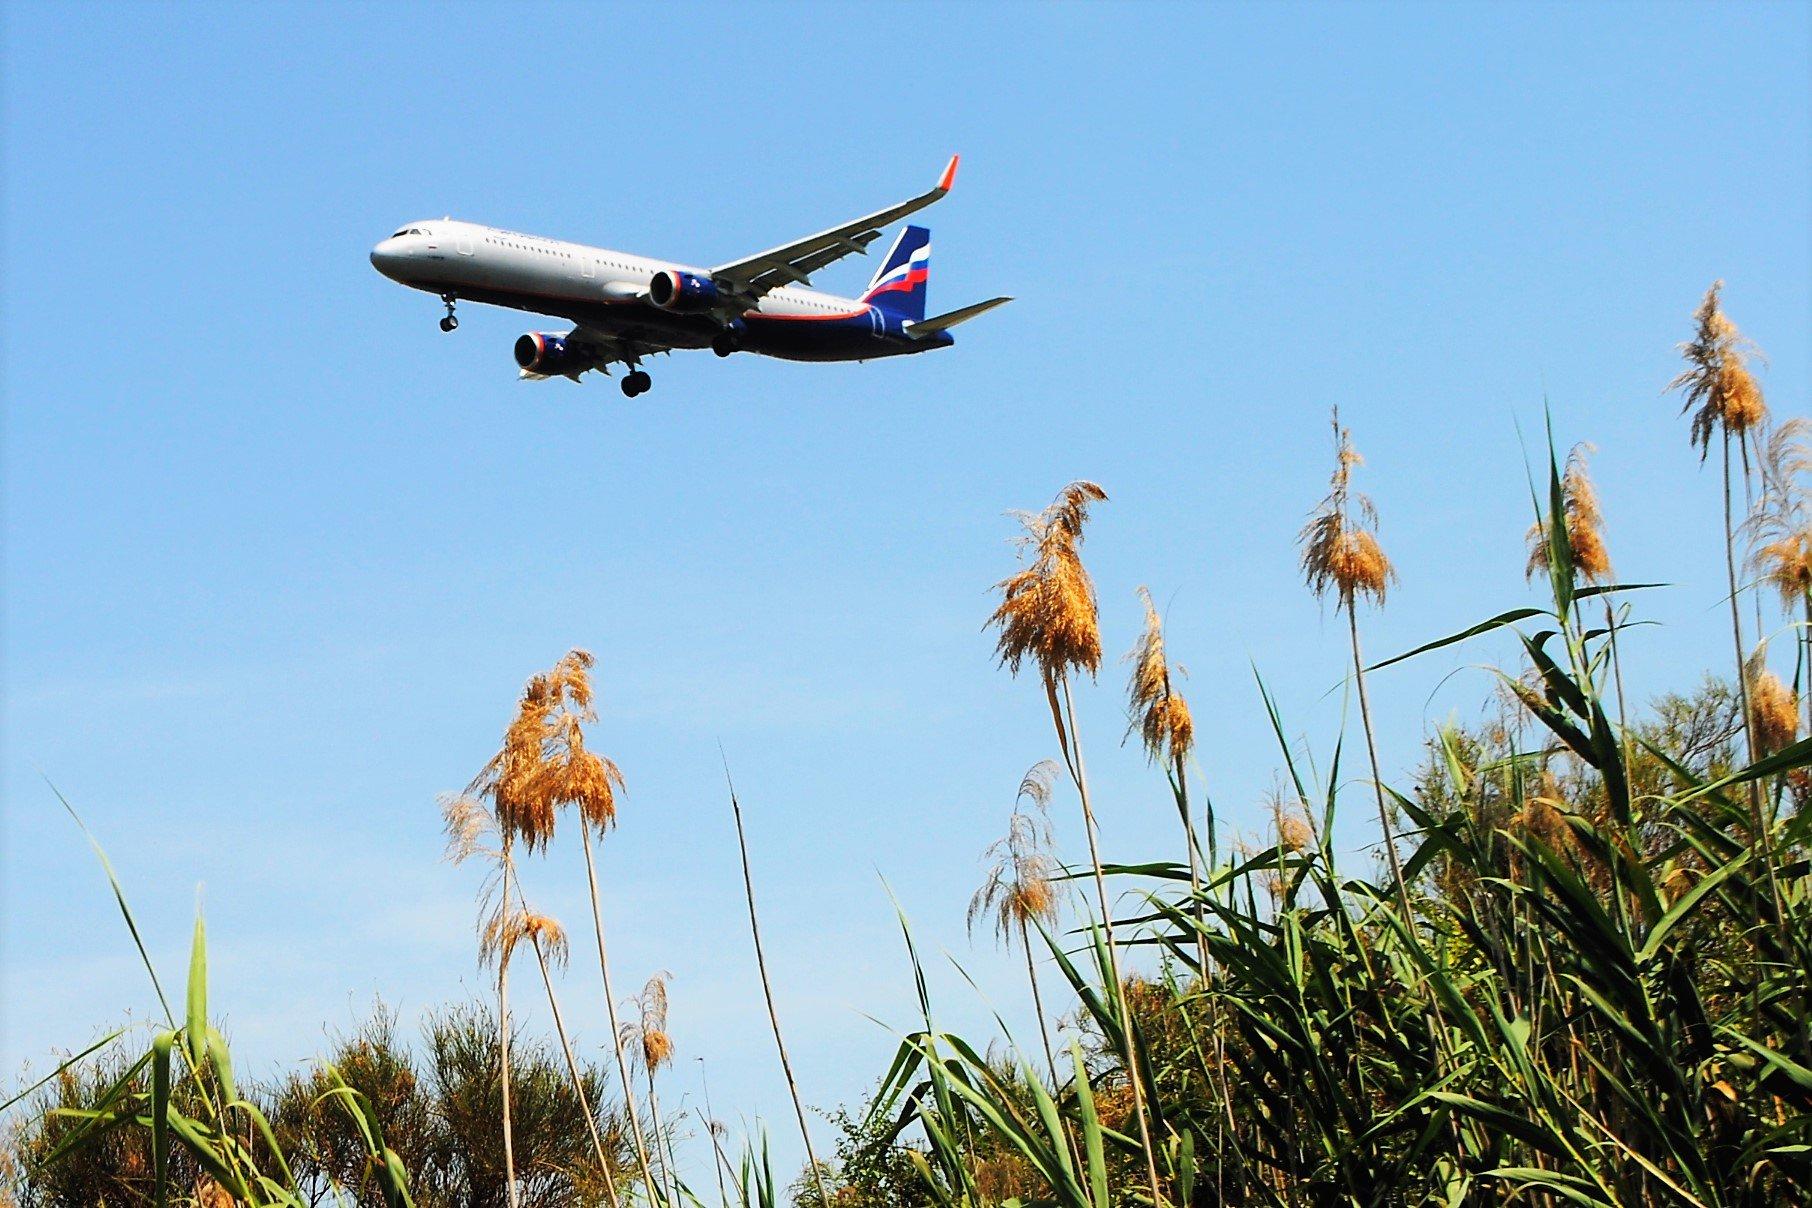 fitxa 1 aeroflot catàleg avions ocell de ferro llobregat delta